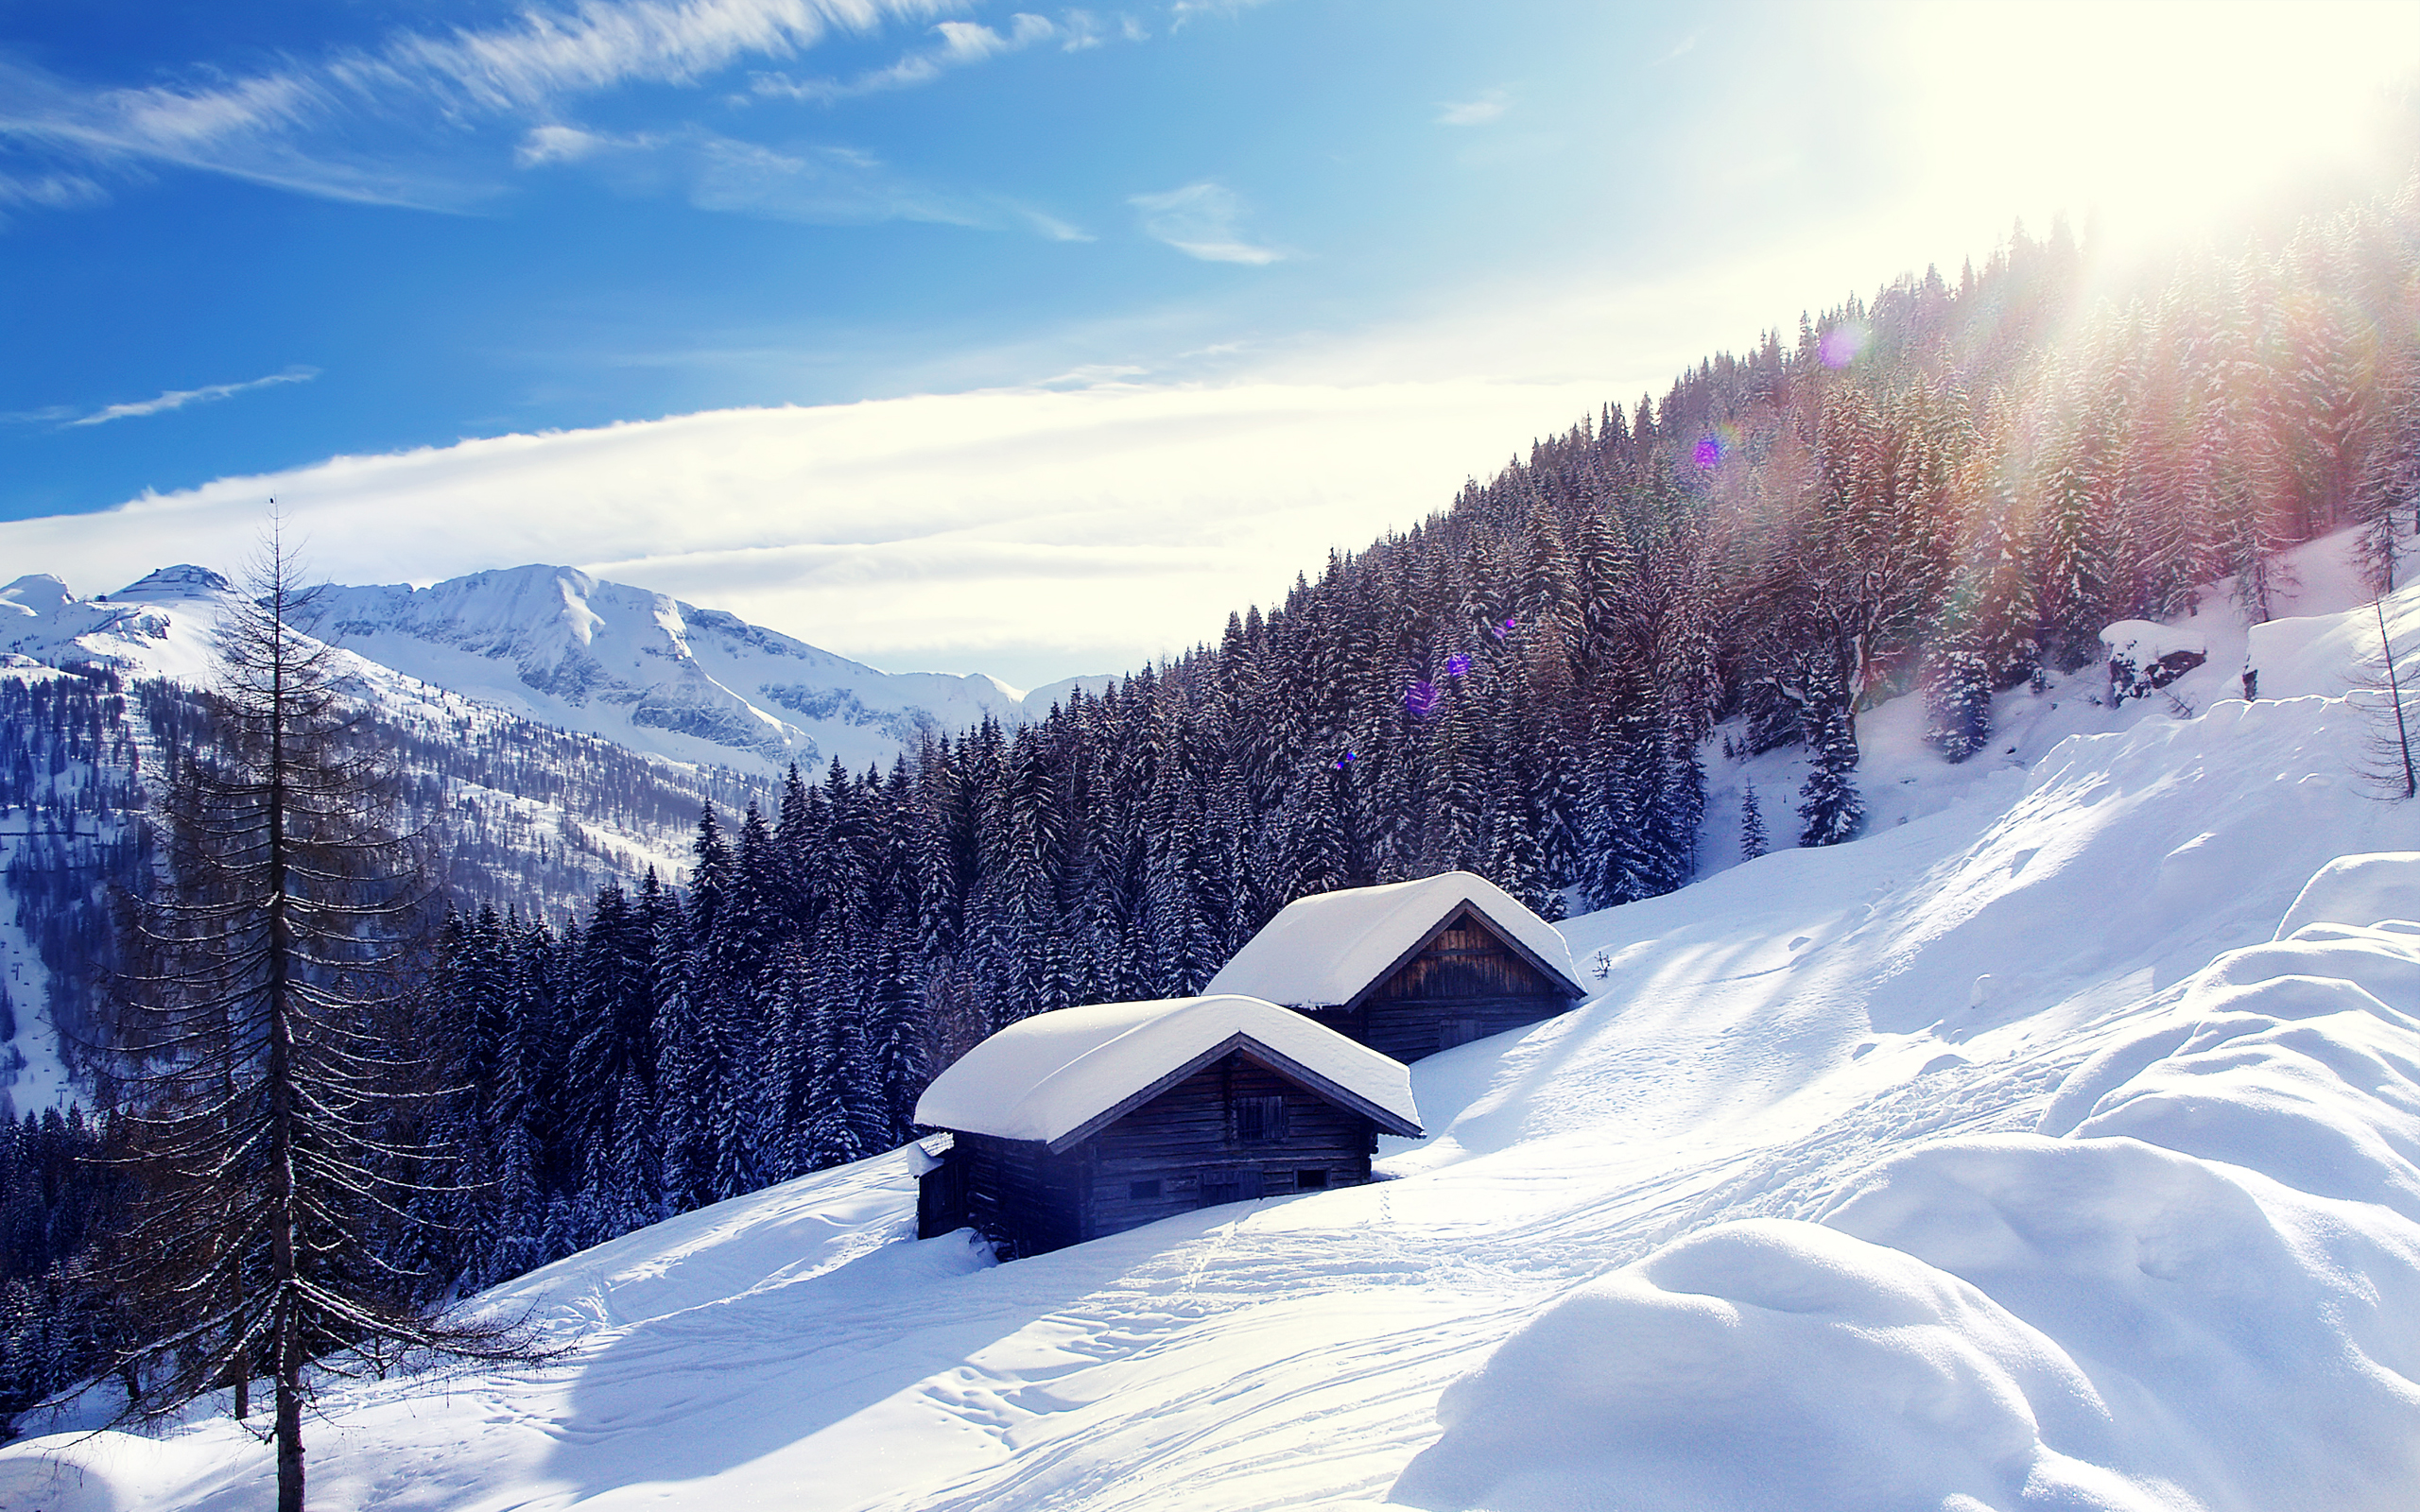 HD Wallpapers Ski Touring Austria Alps